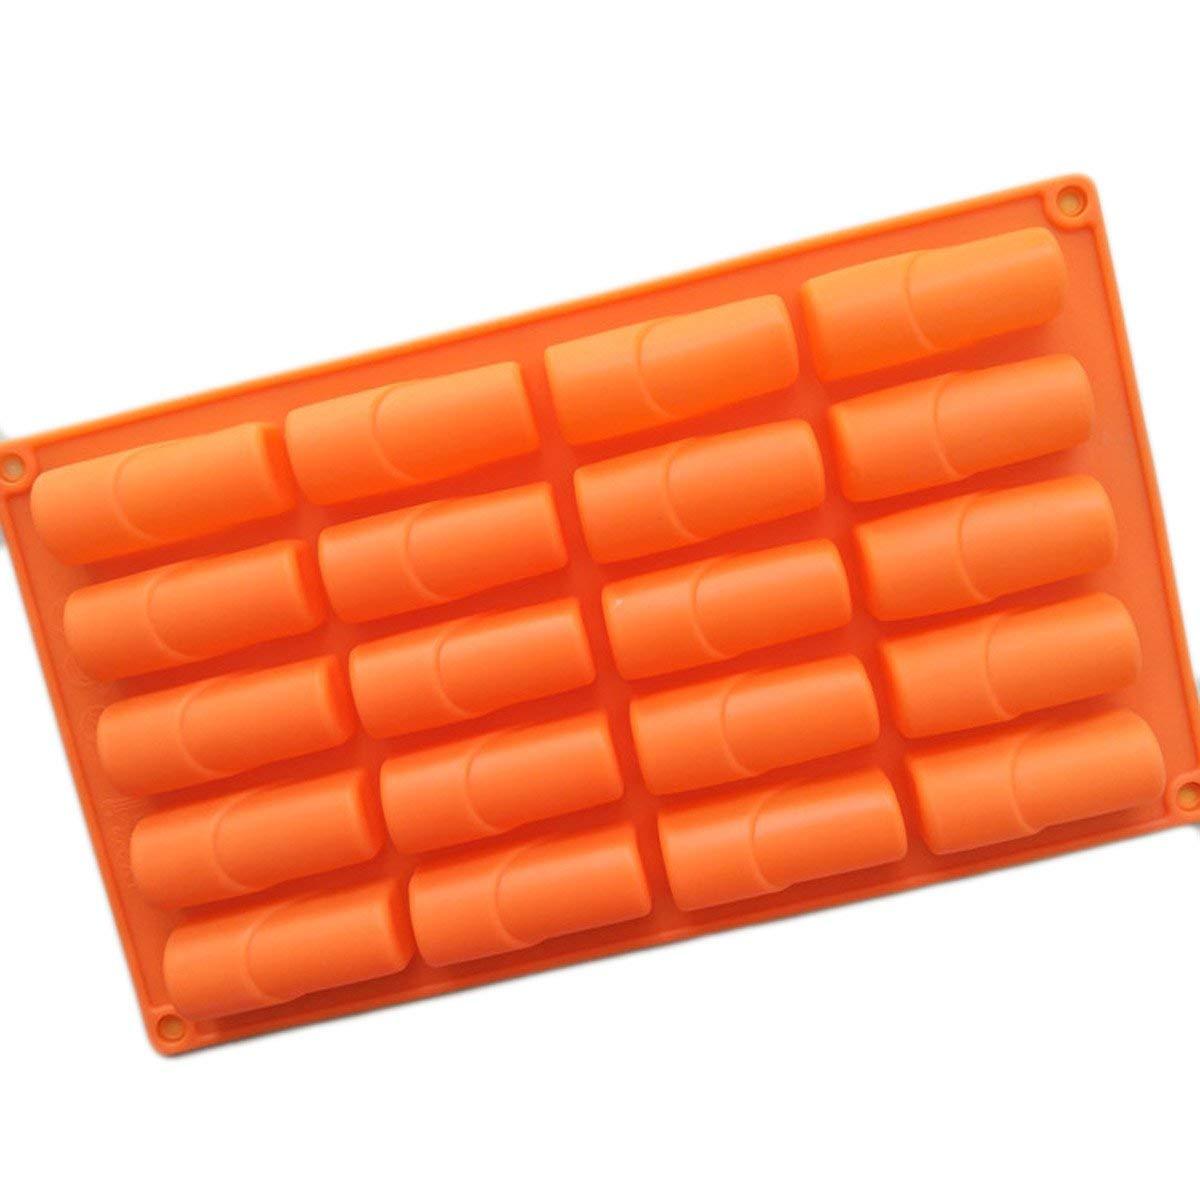 Longzang 20 Cavity Lipstick shape Silicone Mold for Cake Chocolate Baking molds Ice tray